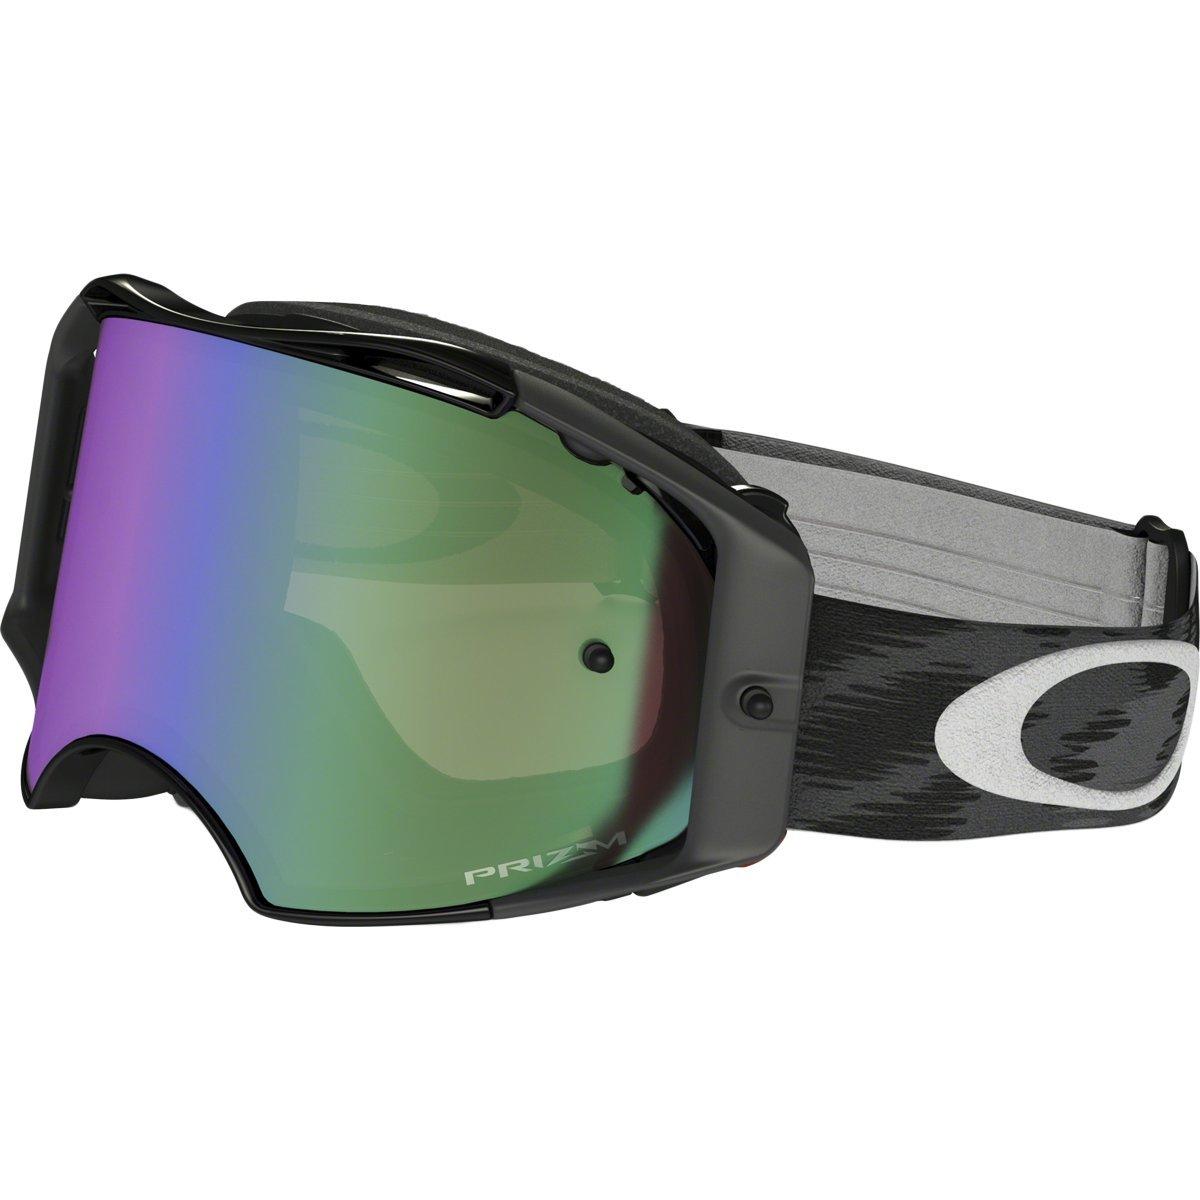 Oakley Airbrake MX Jet Black wPrizmMX Jade unisex-adult Goggles (Black, Medium), 1 Pack